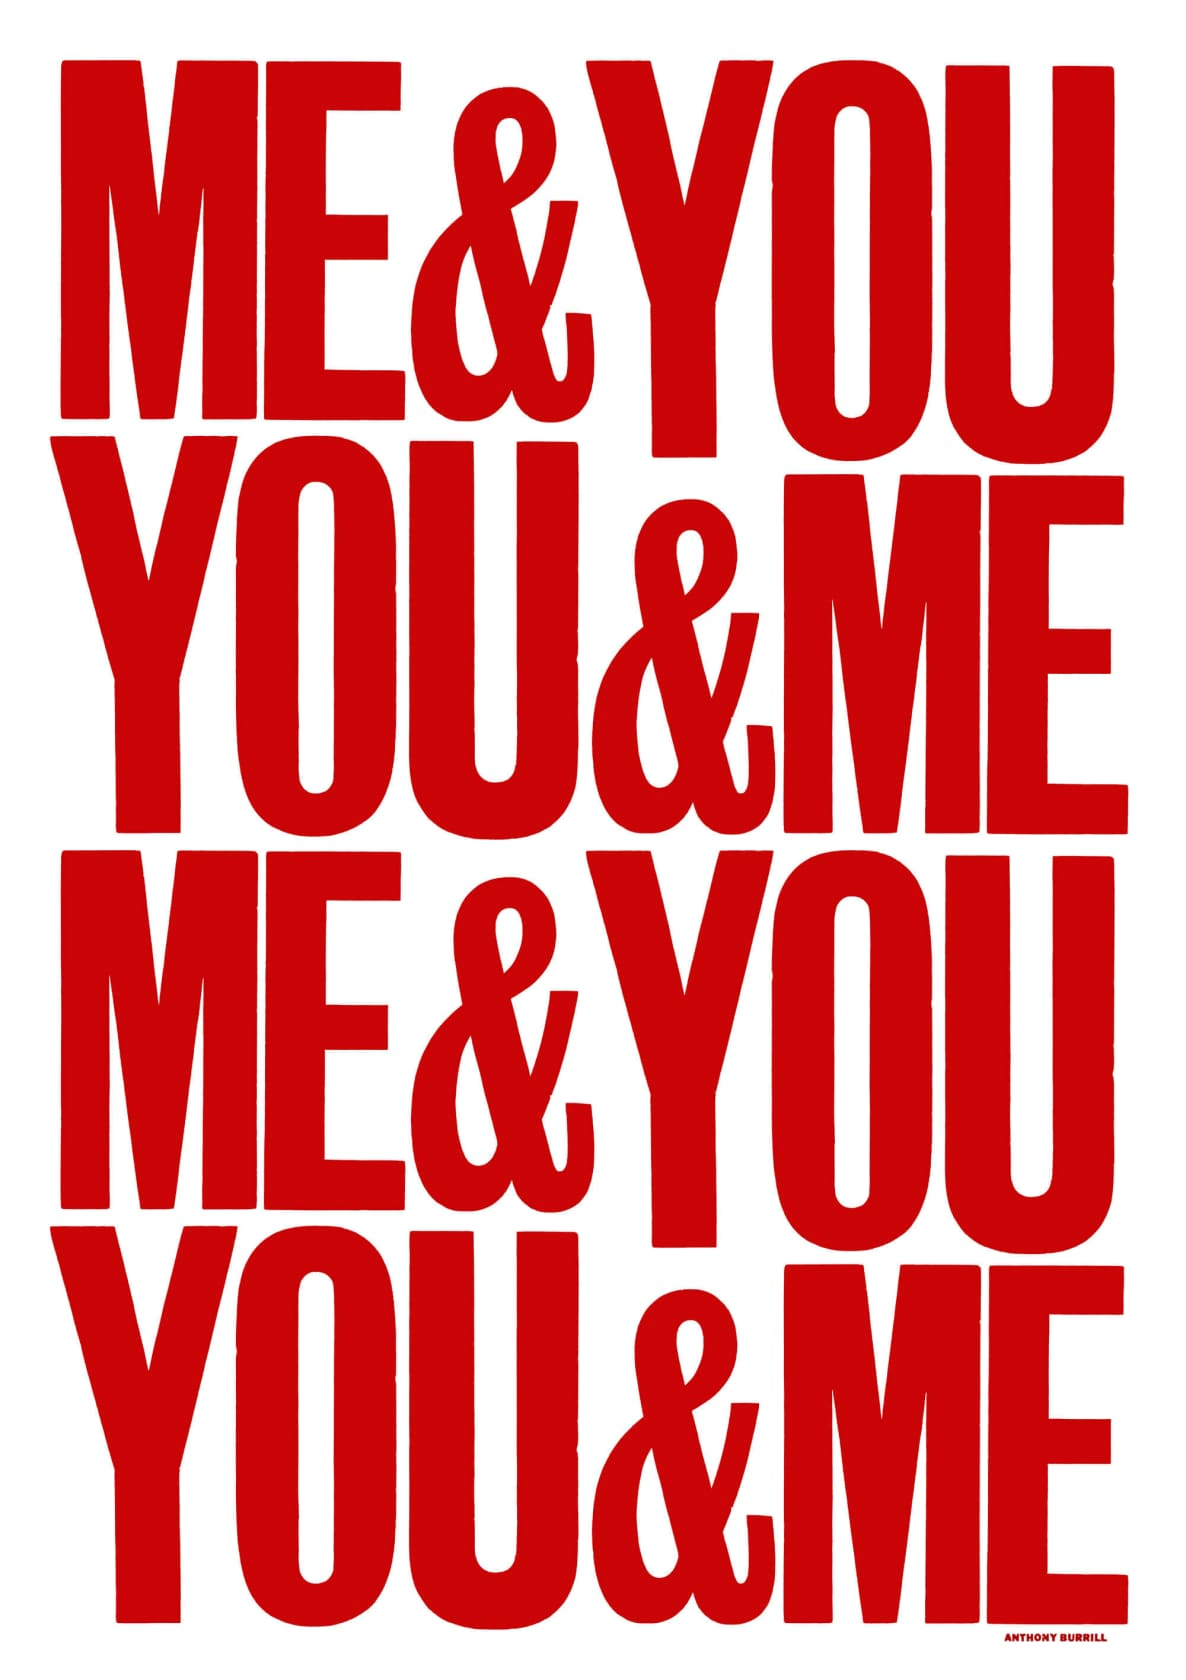 ANTHONY BURRILL YOU&ME&ME&YOU 1 colour screenprint onto G.F Smith Colorplan Bright White